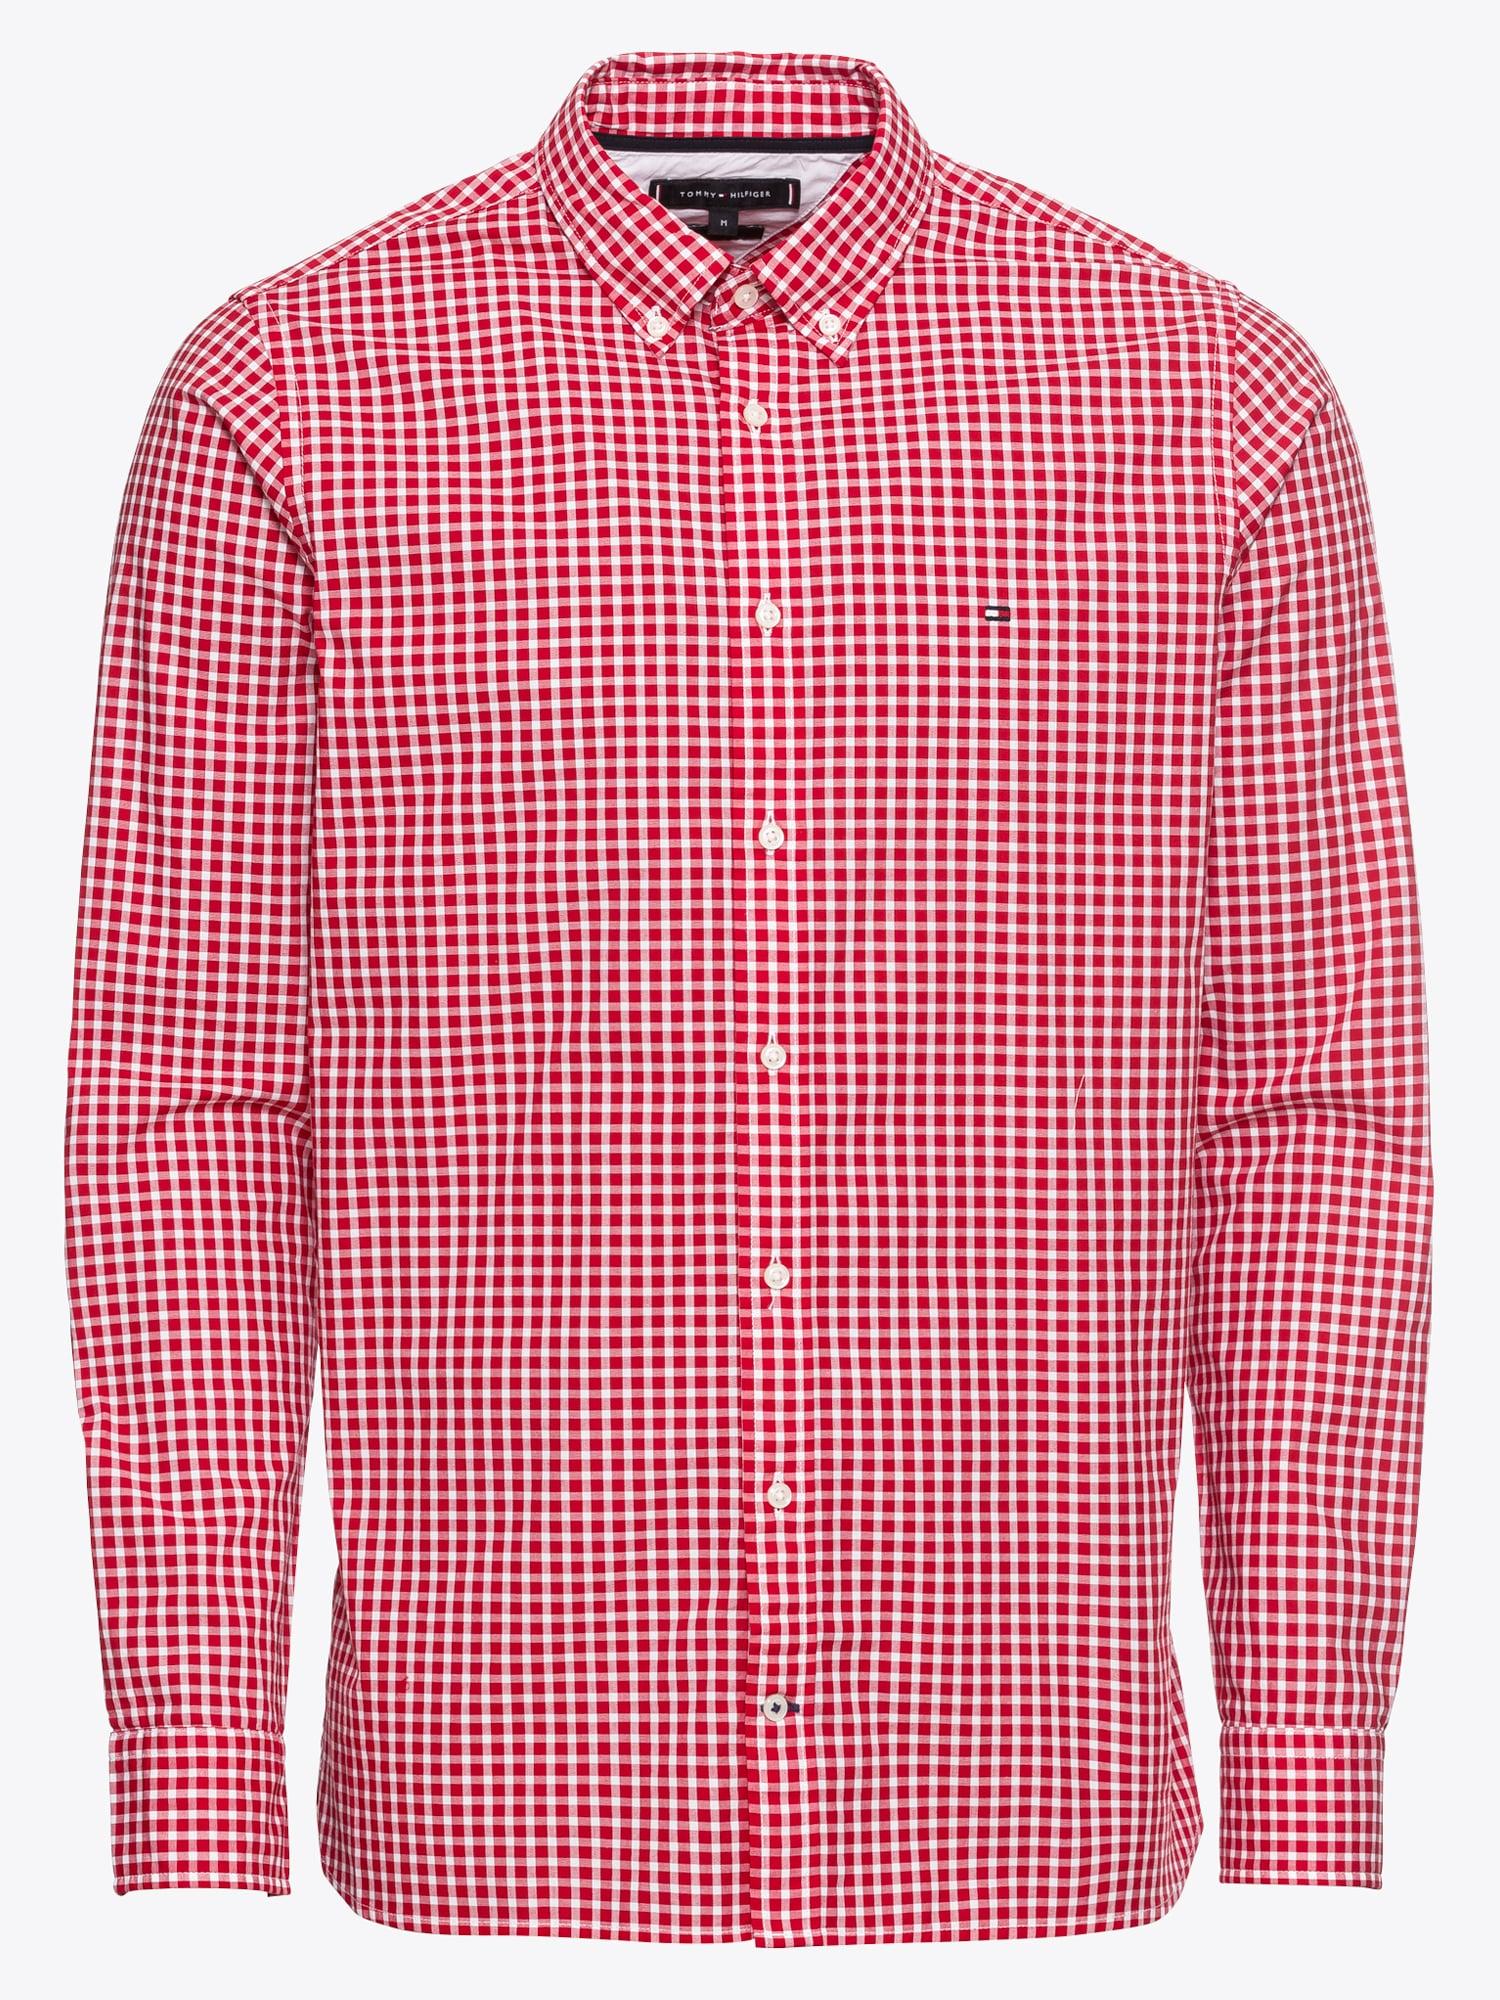 Heren Overhemd Rood.Tommy Hilfiger Heren Overhemd Urban Hiker Check Shirt Blauw Rood Wit